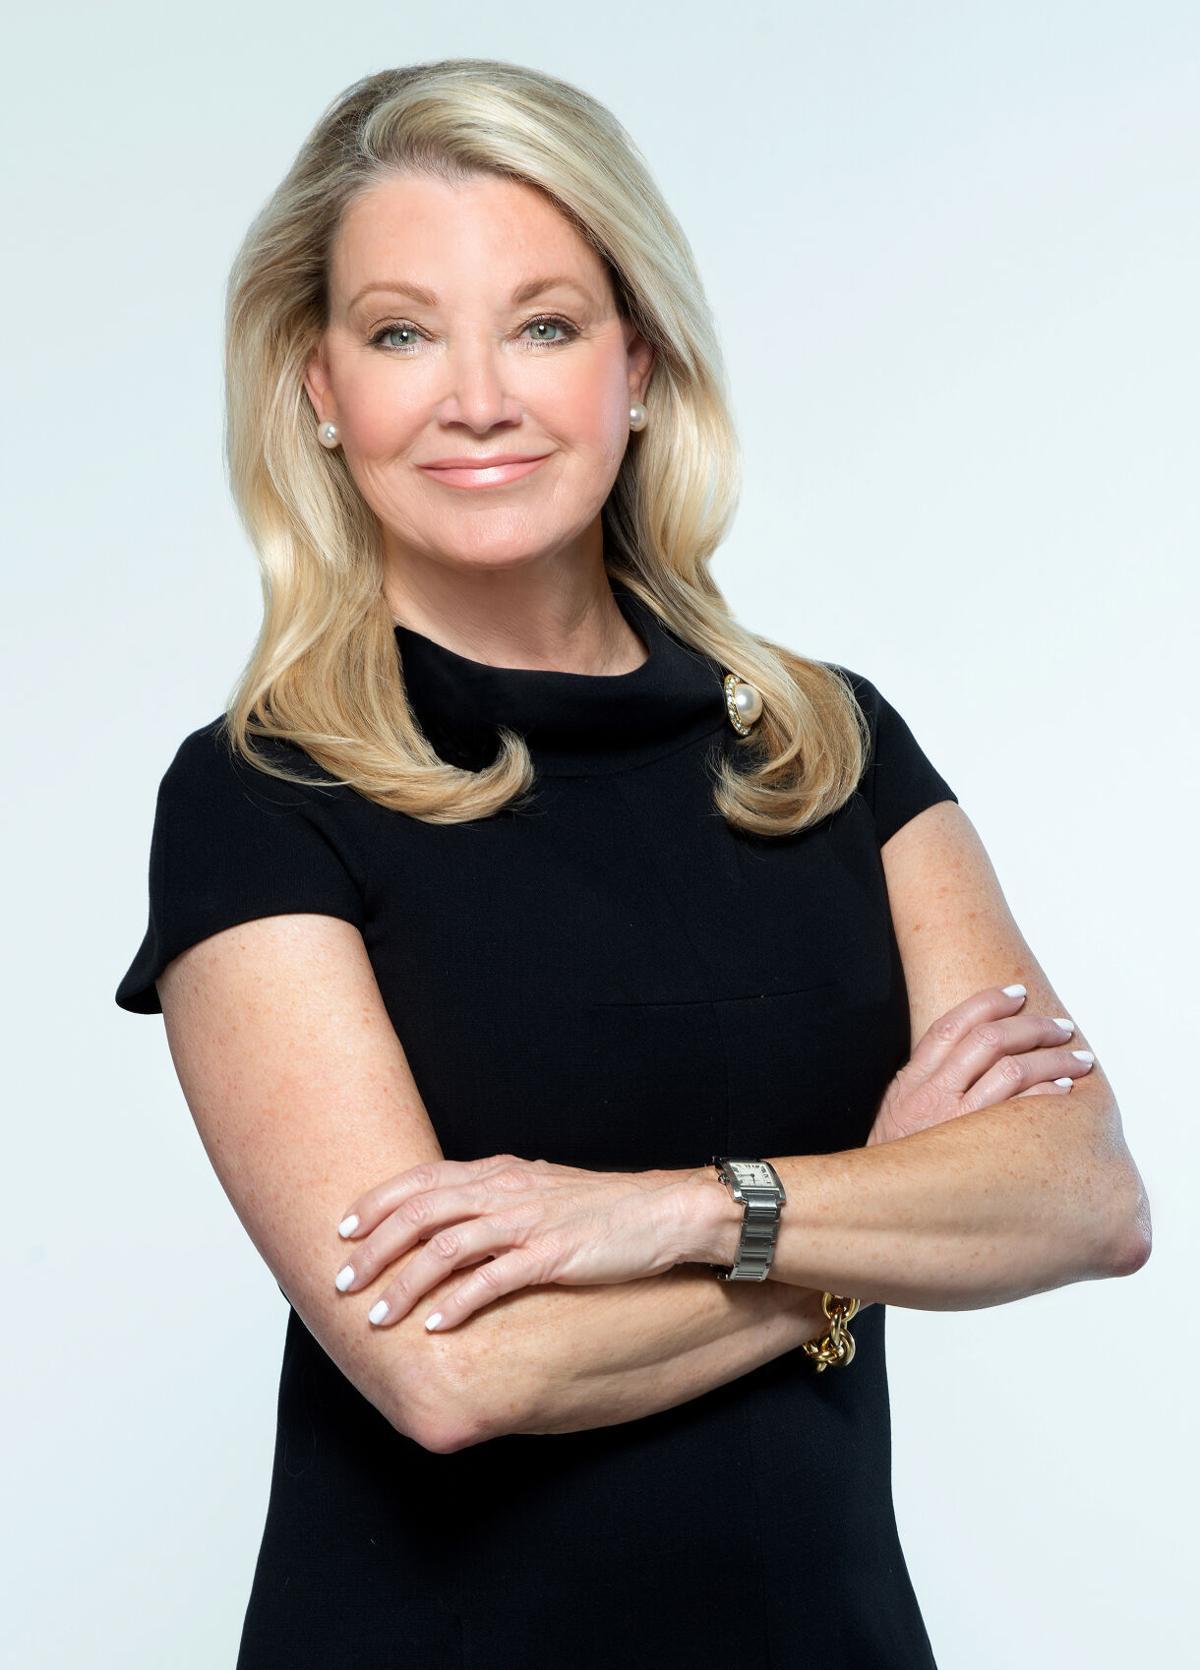 Deborah Caplenor